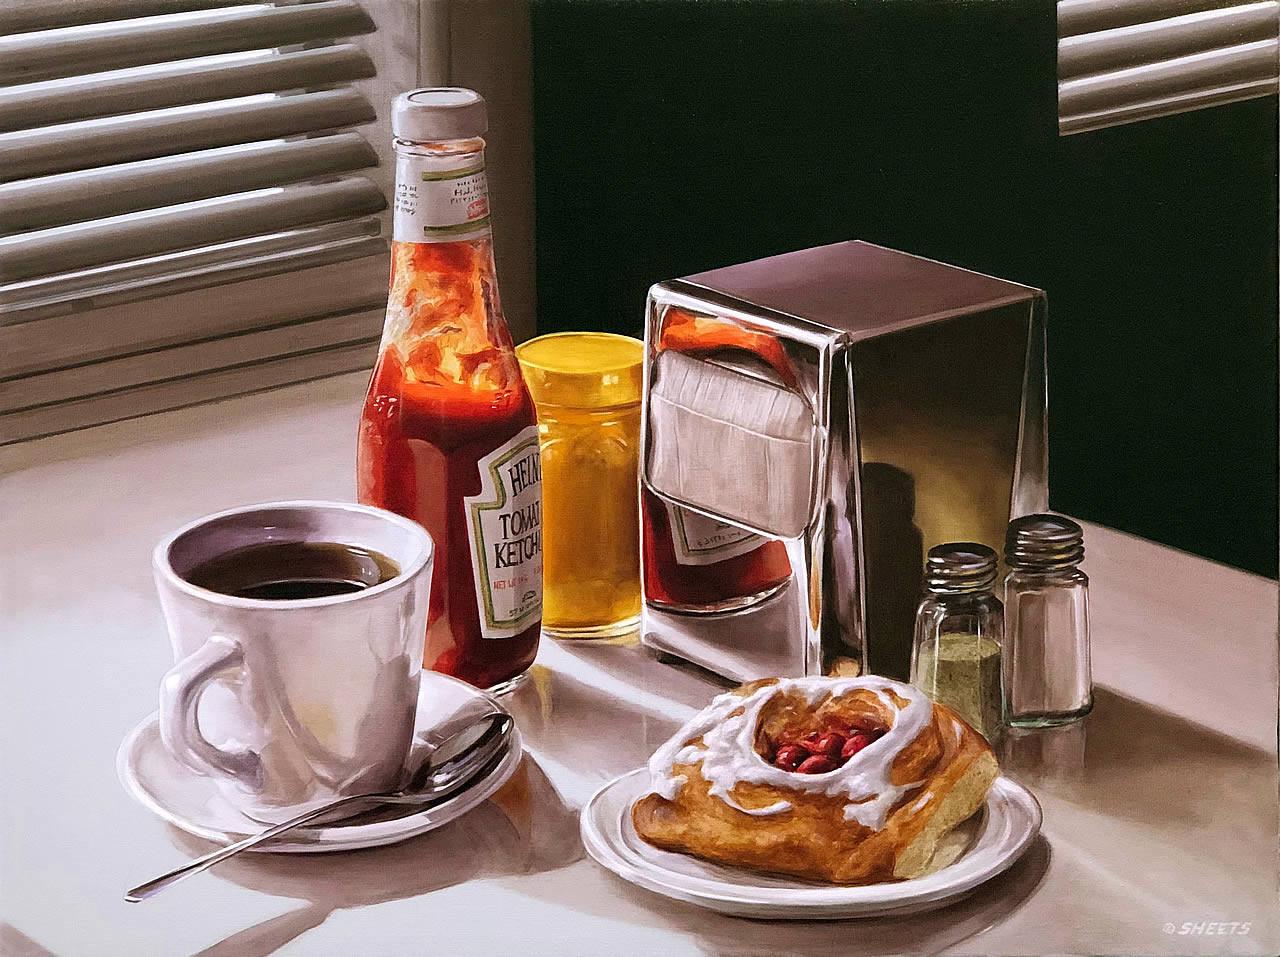 Coffee and Danish